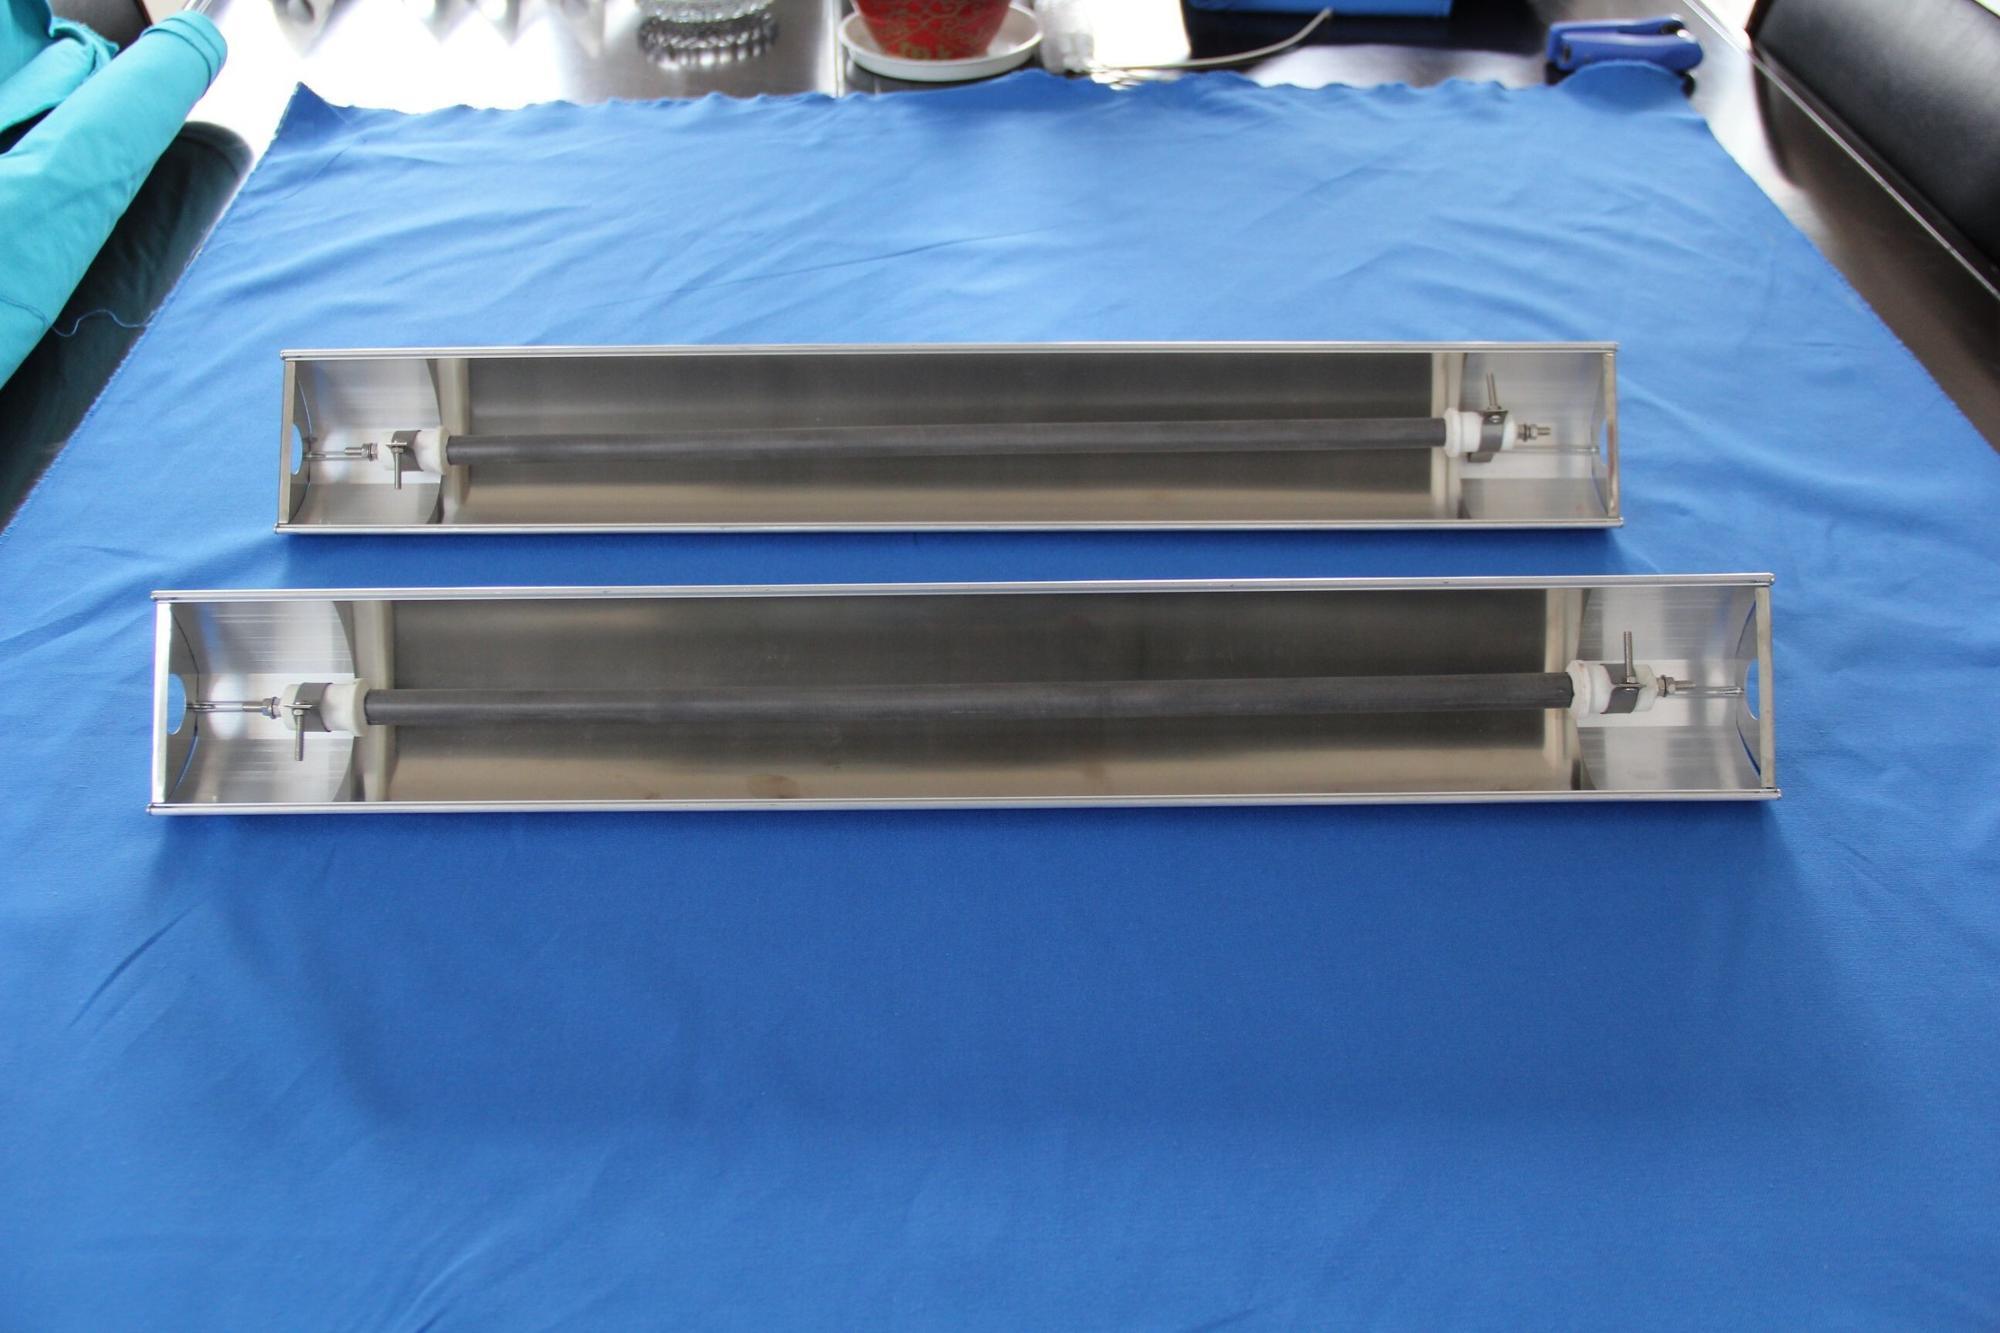 HT-PHC004 आंगन आउटडोर हीटिंग चीनी मिट्टी अवरक्त हीटर